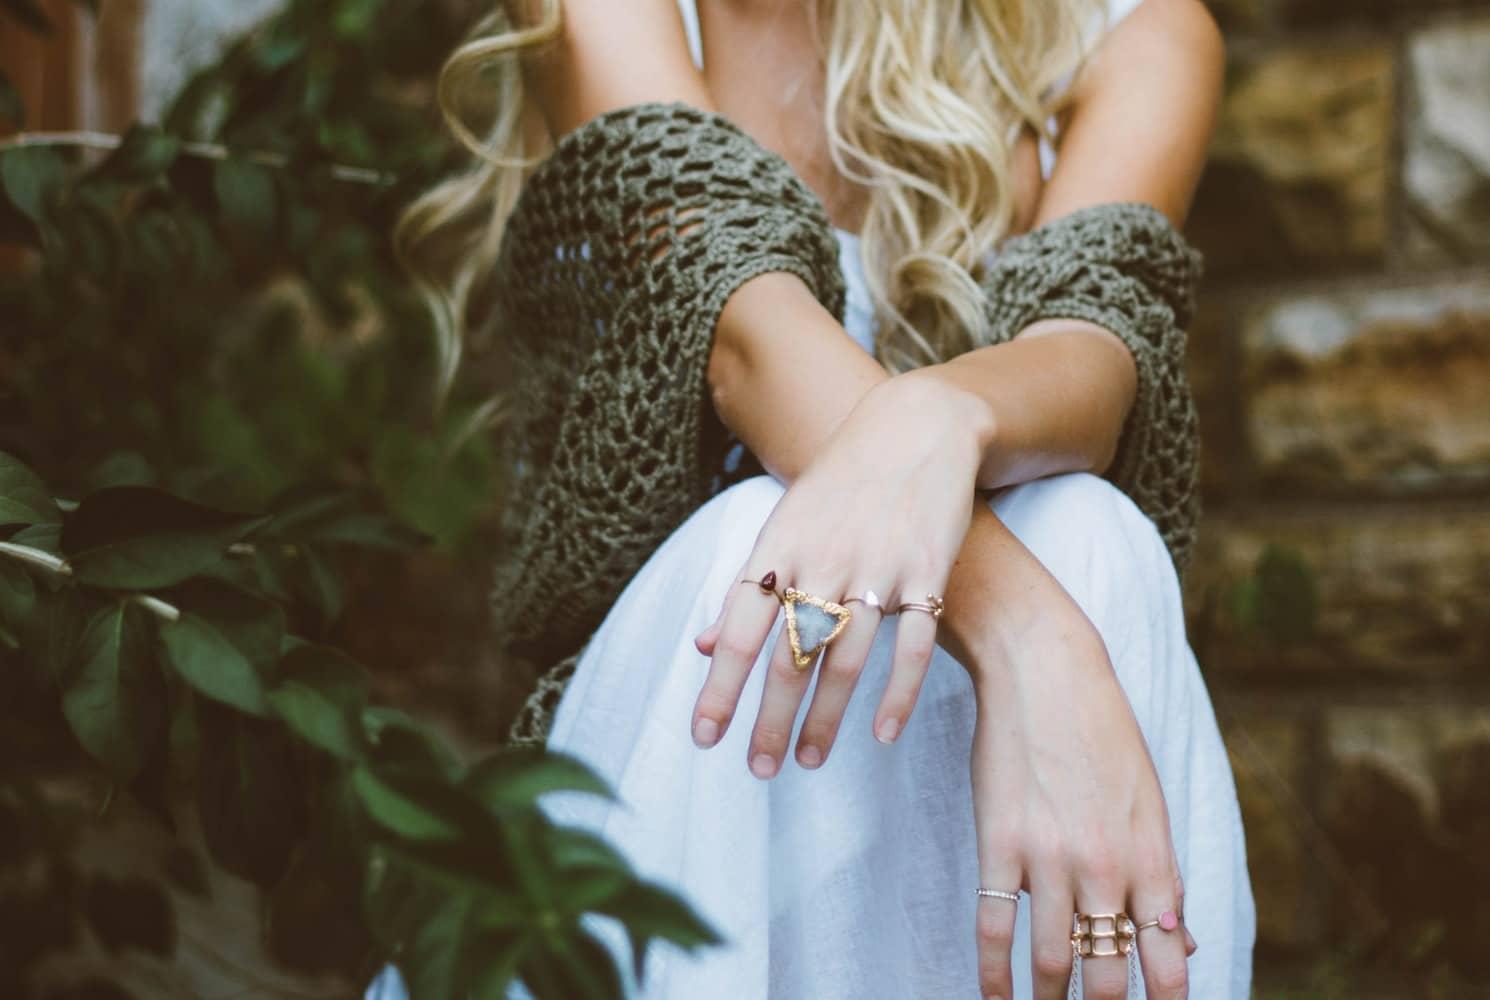 forme bagues mains doigts blonde robe mode